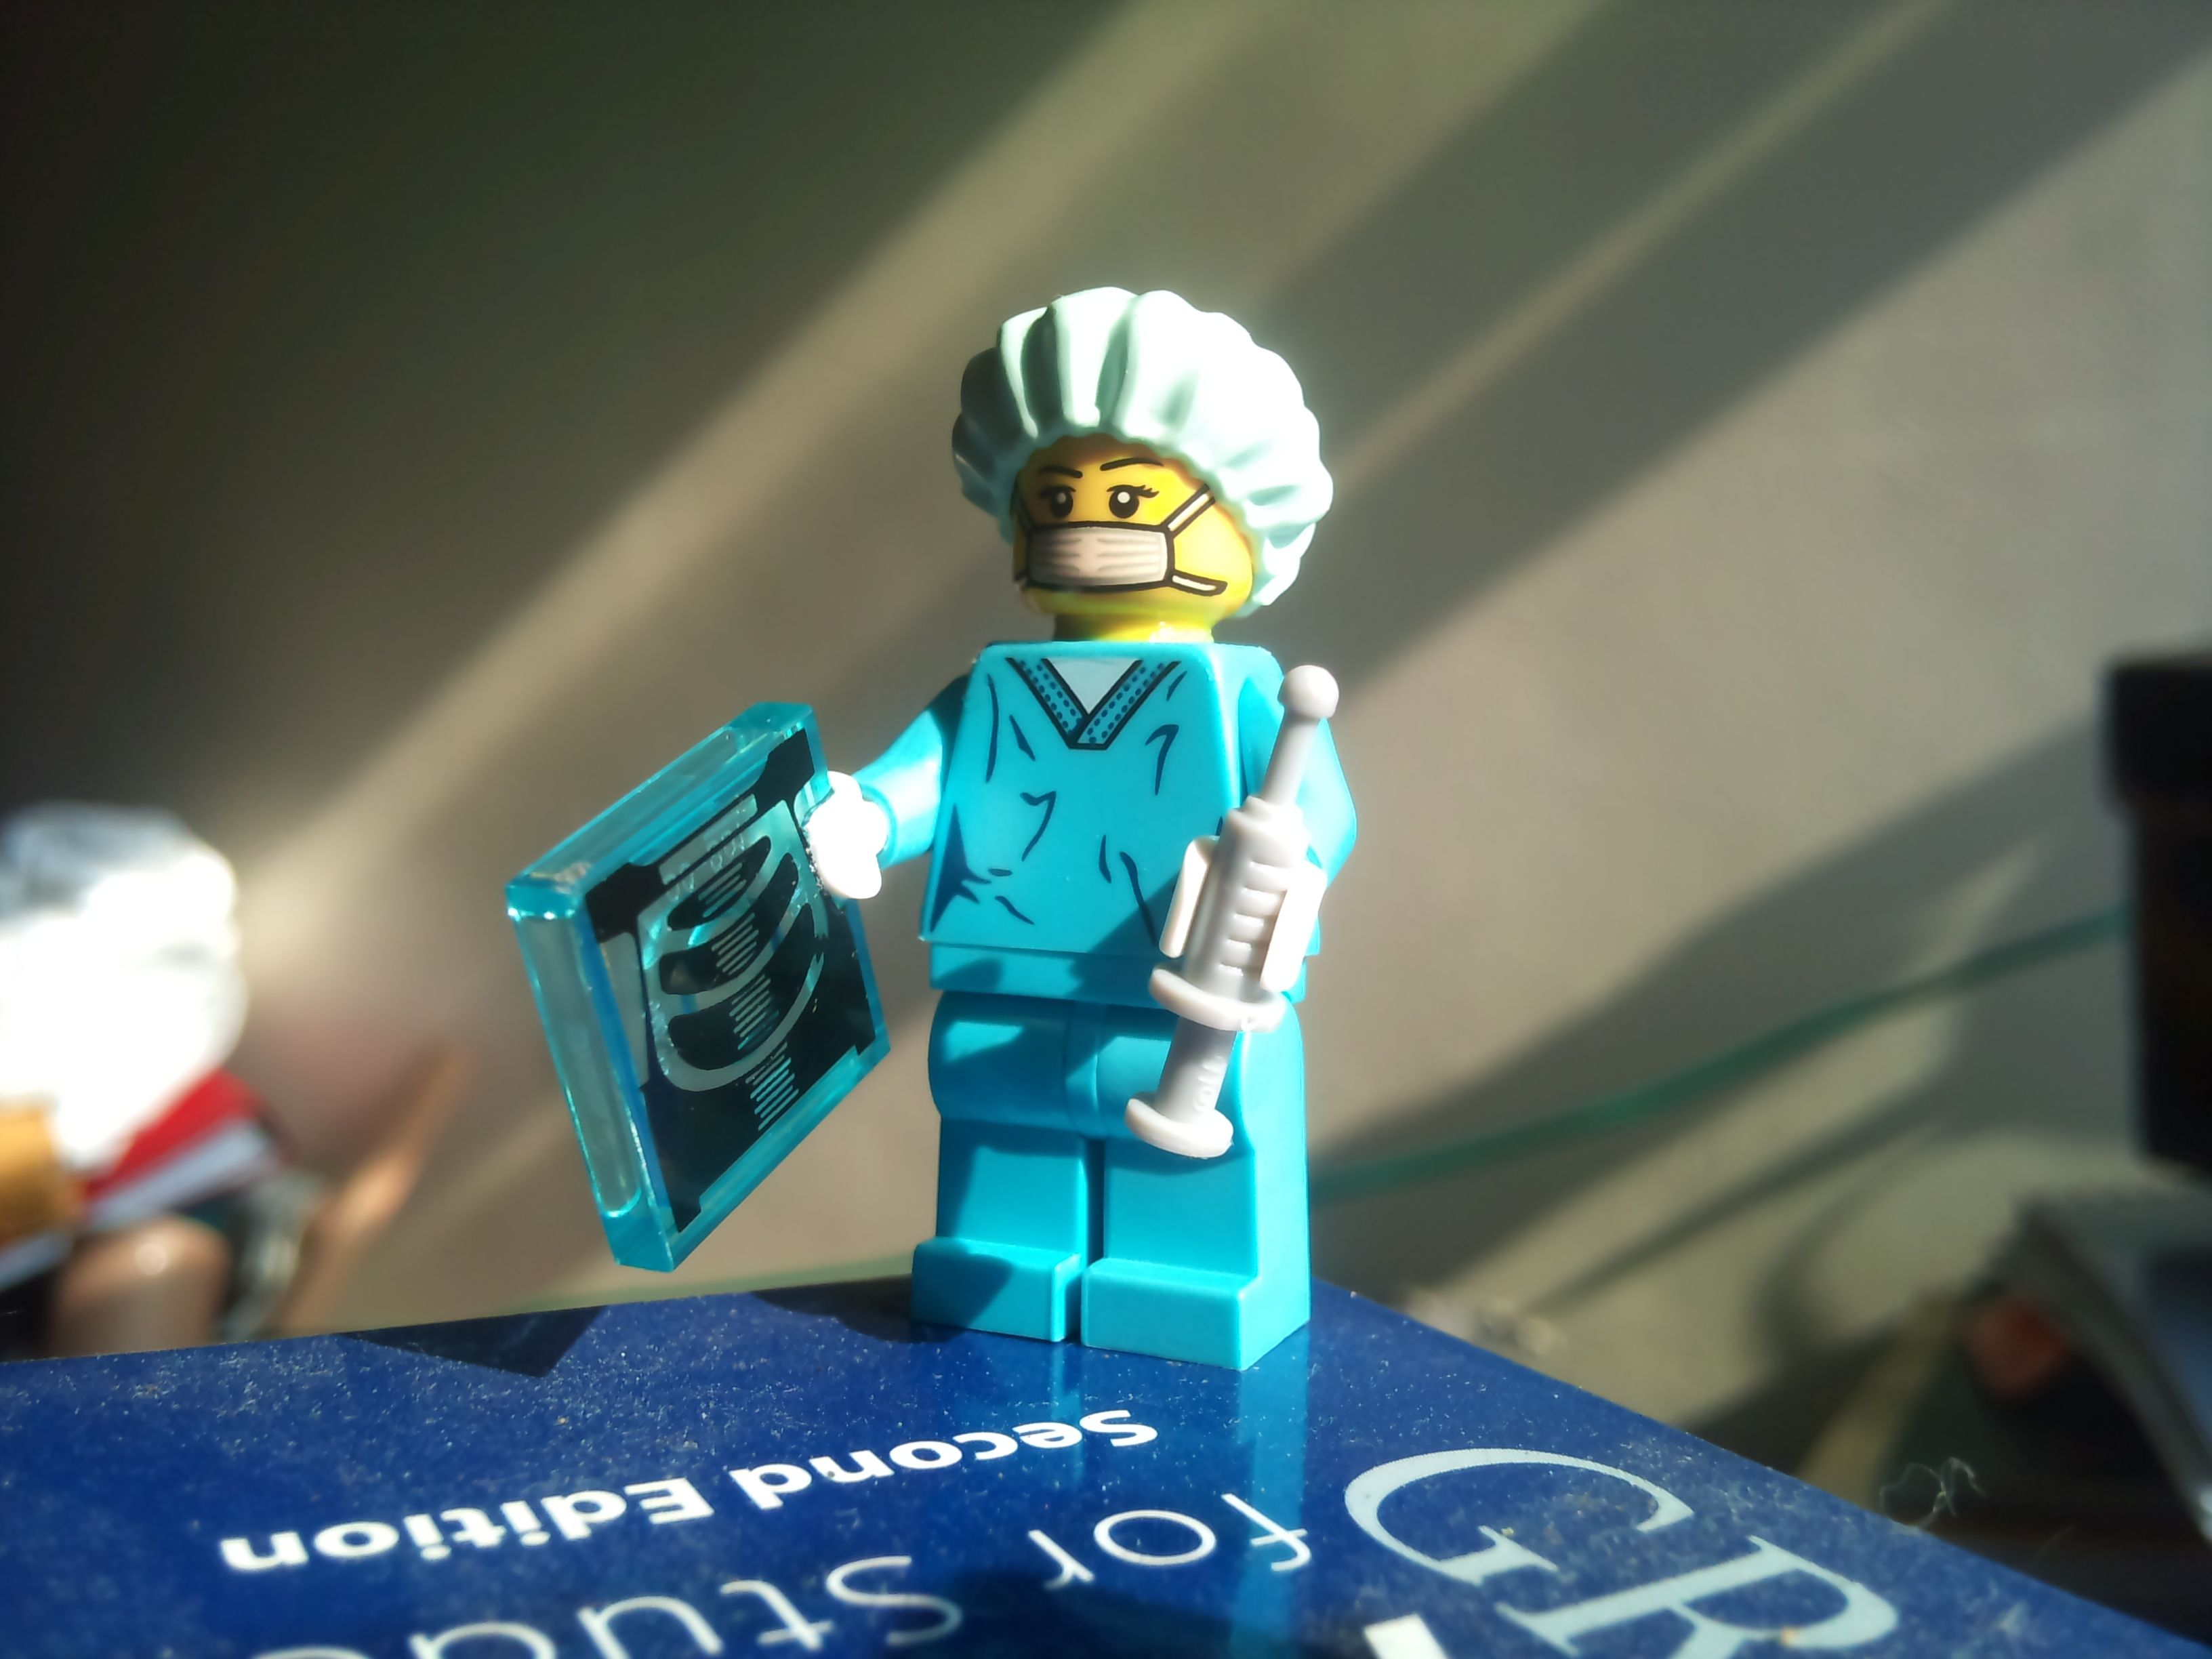 Surgeon lego man | Lego man, Vault boy, Lego